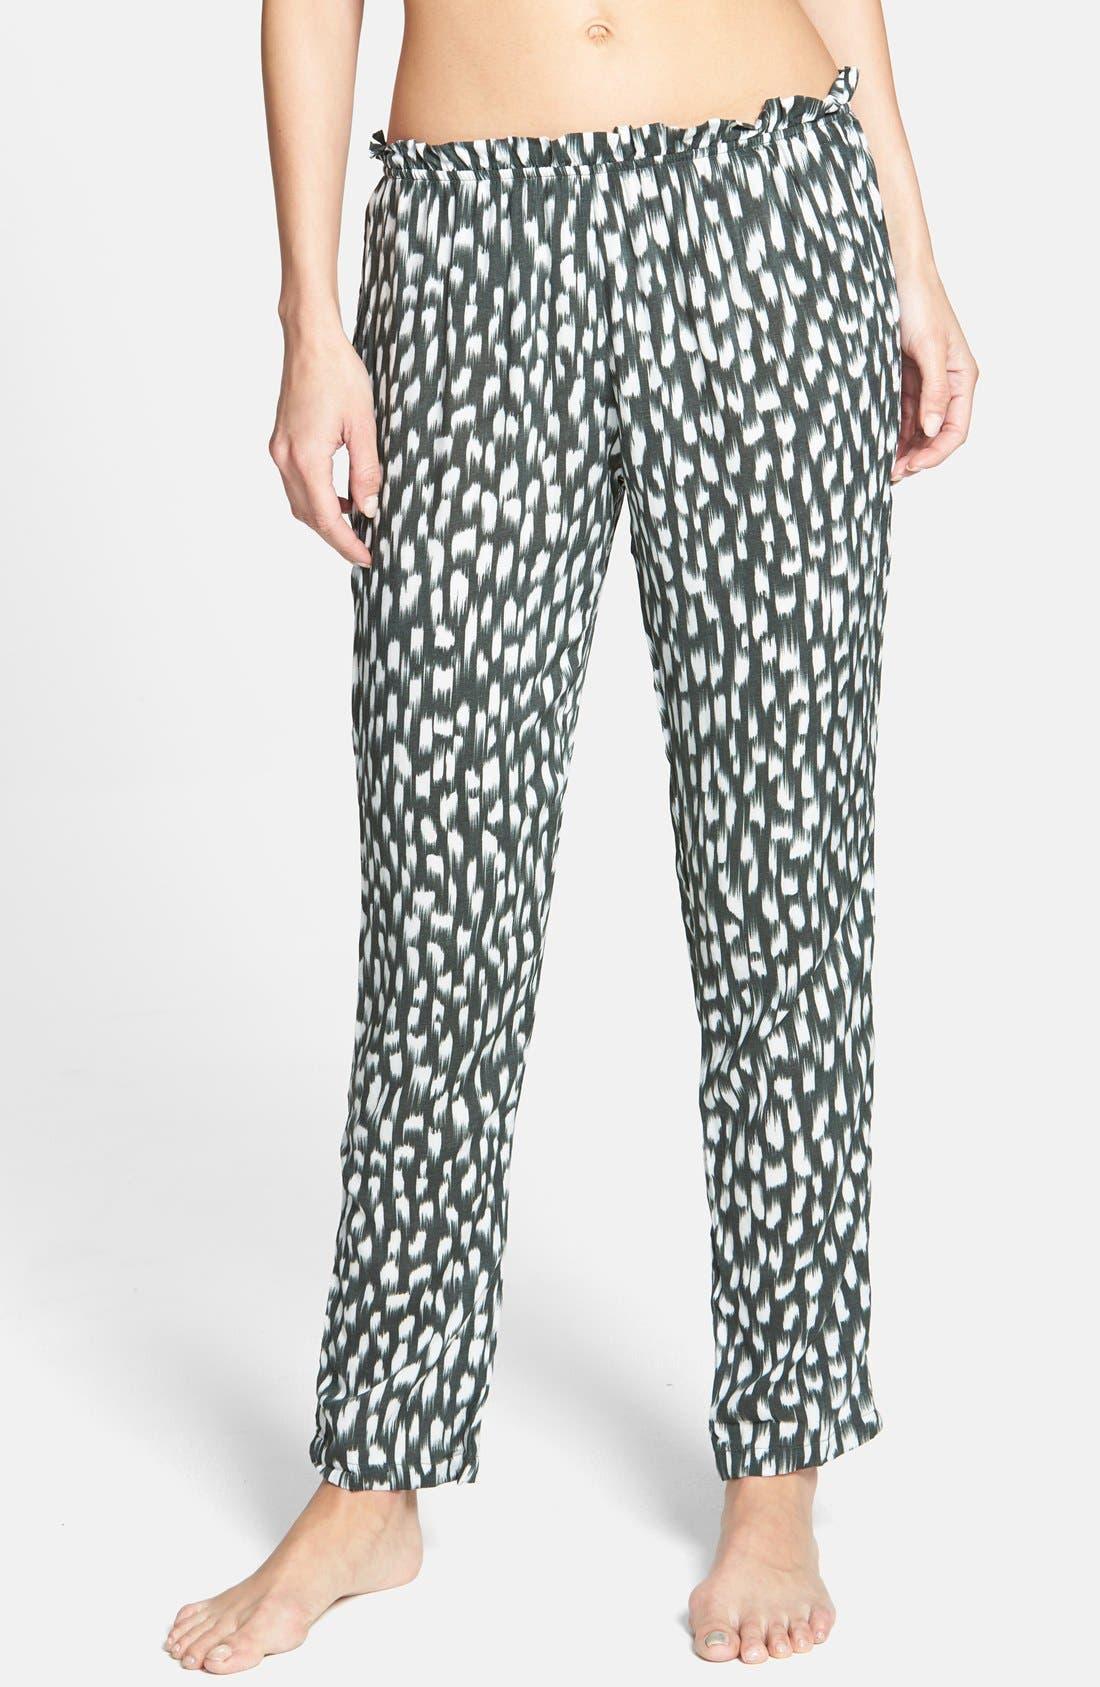 Alternate Image 1 Selected - Eberjey 'Wild Brush Jasper' Roll Tab Cover-Up Pants